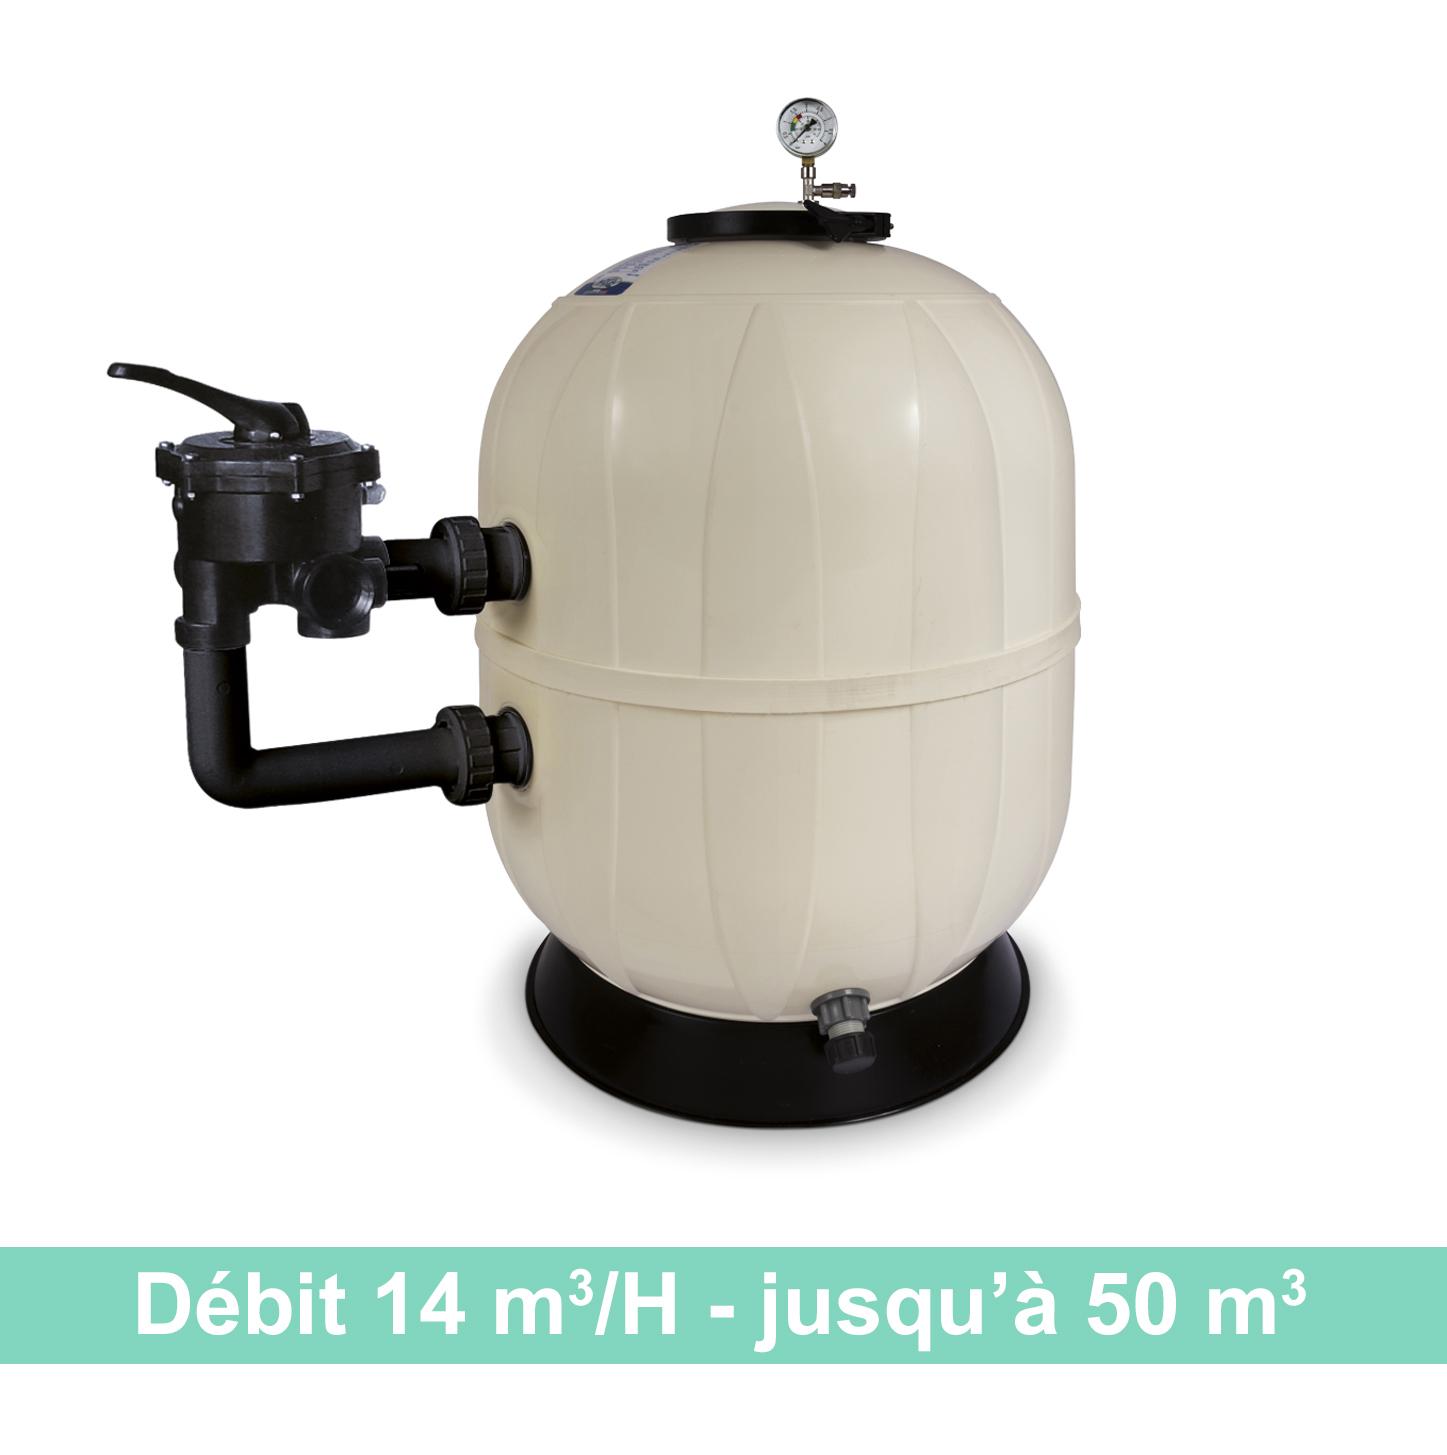 Kristal Sand Side - filtre à sable